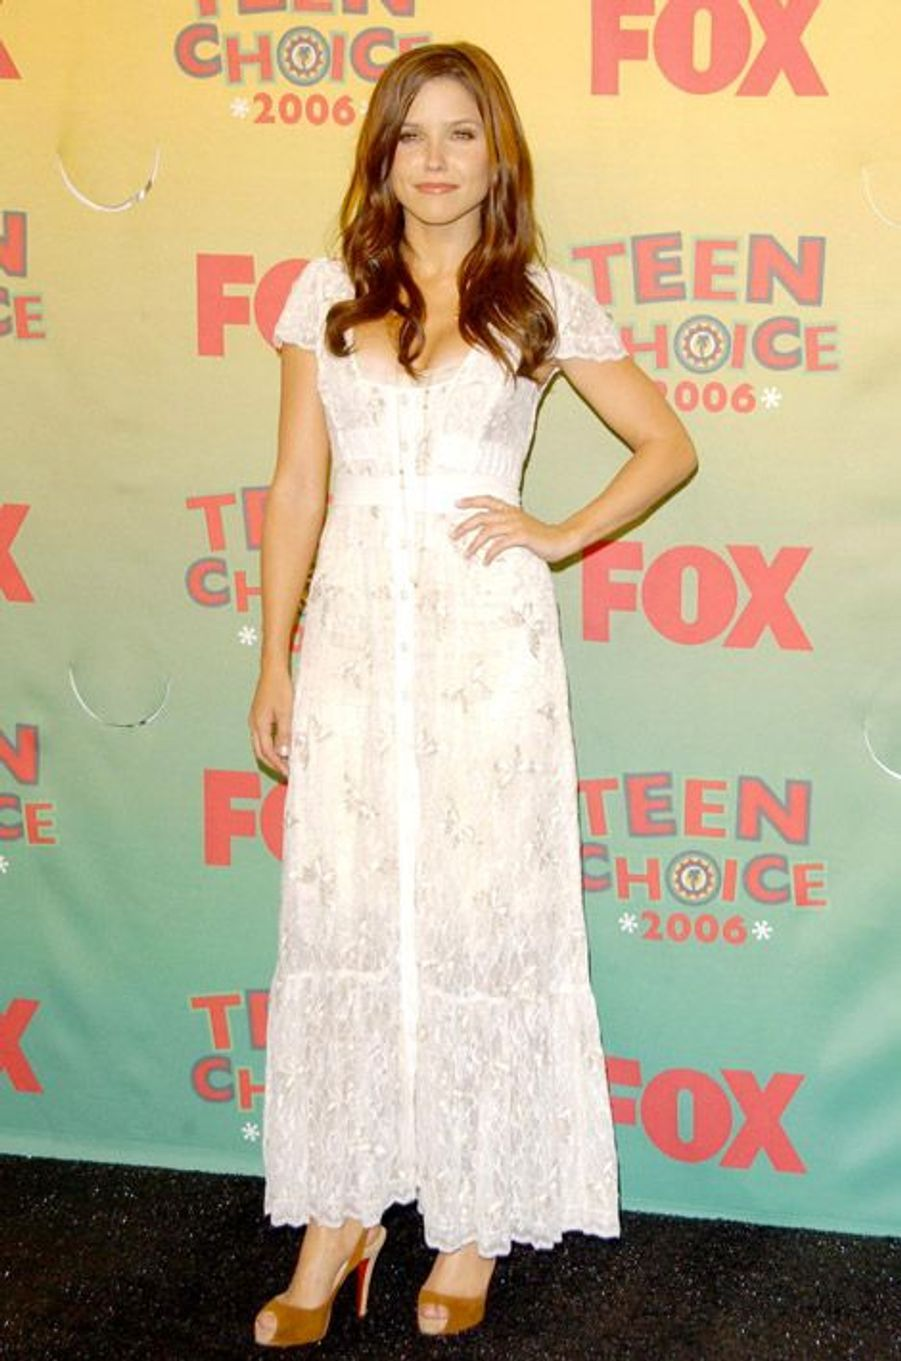 En 2006, lors de la cérémonie Teen Choice Awards